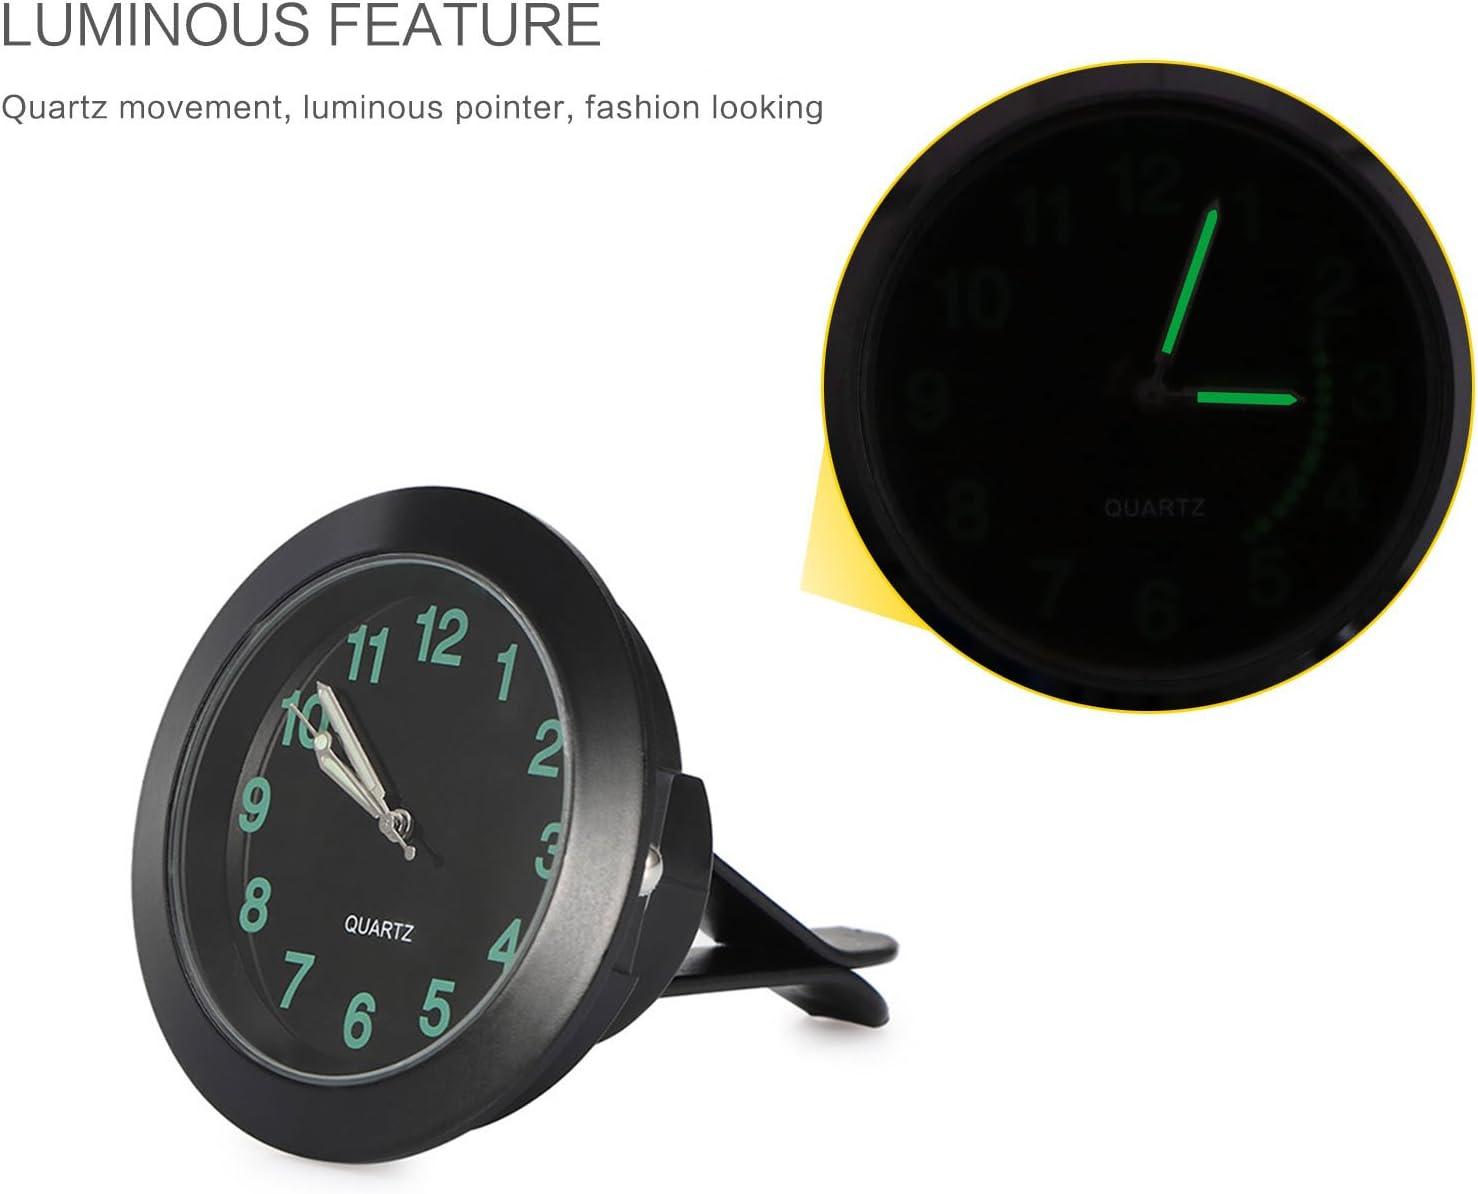 OurLeeme Car Air Vent Clip Clock Automobile Luminous Dashboard Clock Round Analog Quartz Clock Luminous Stick-On Clock with Clip Night Display Black